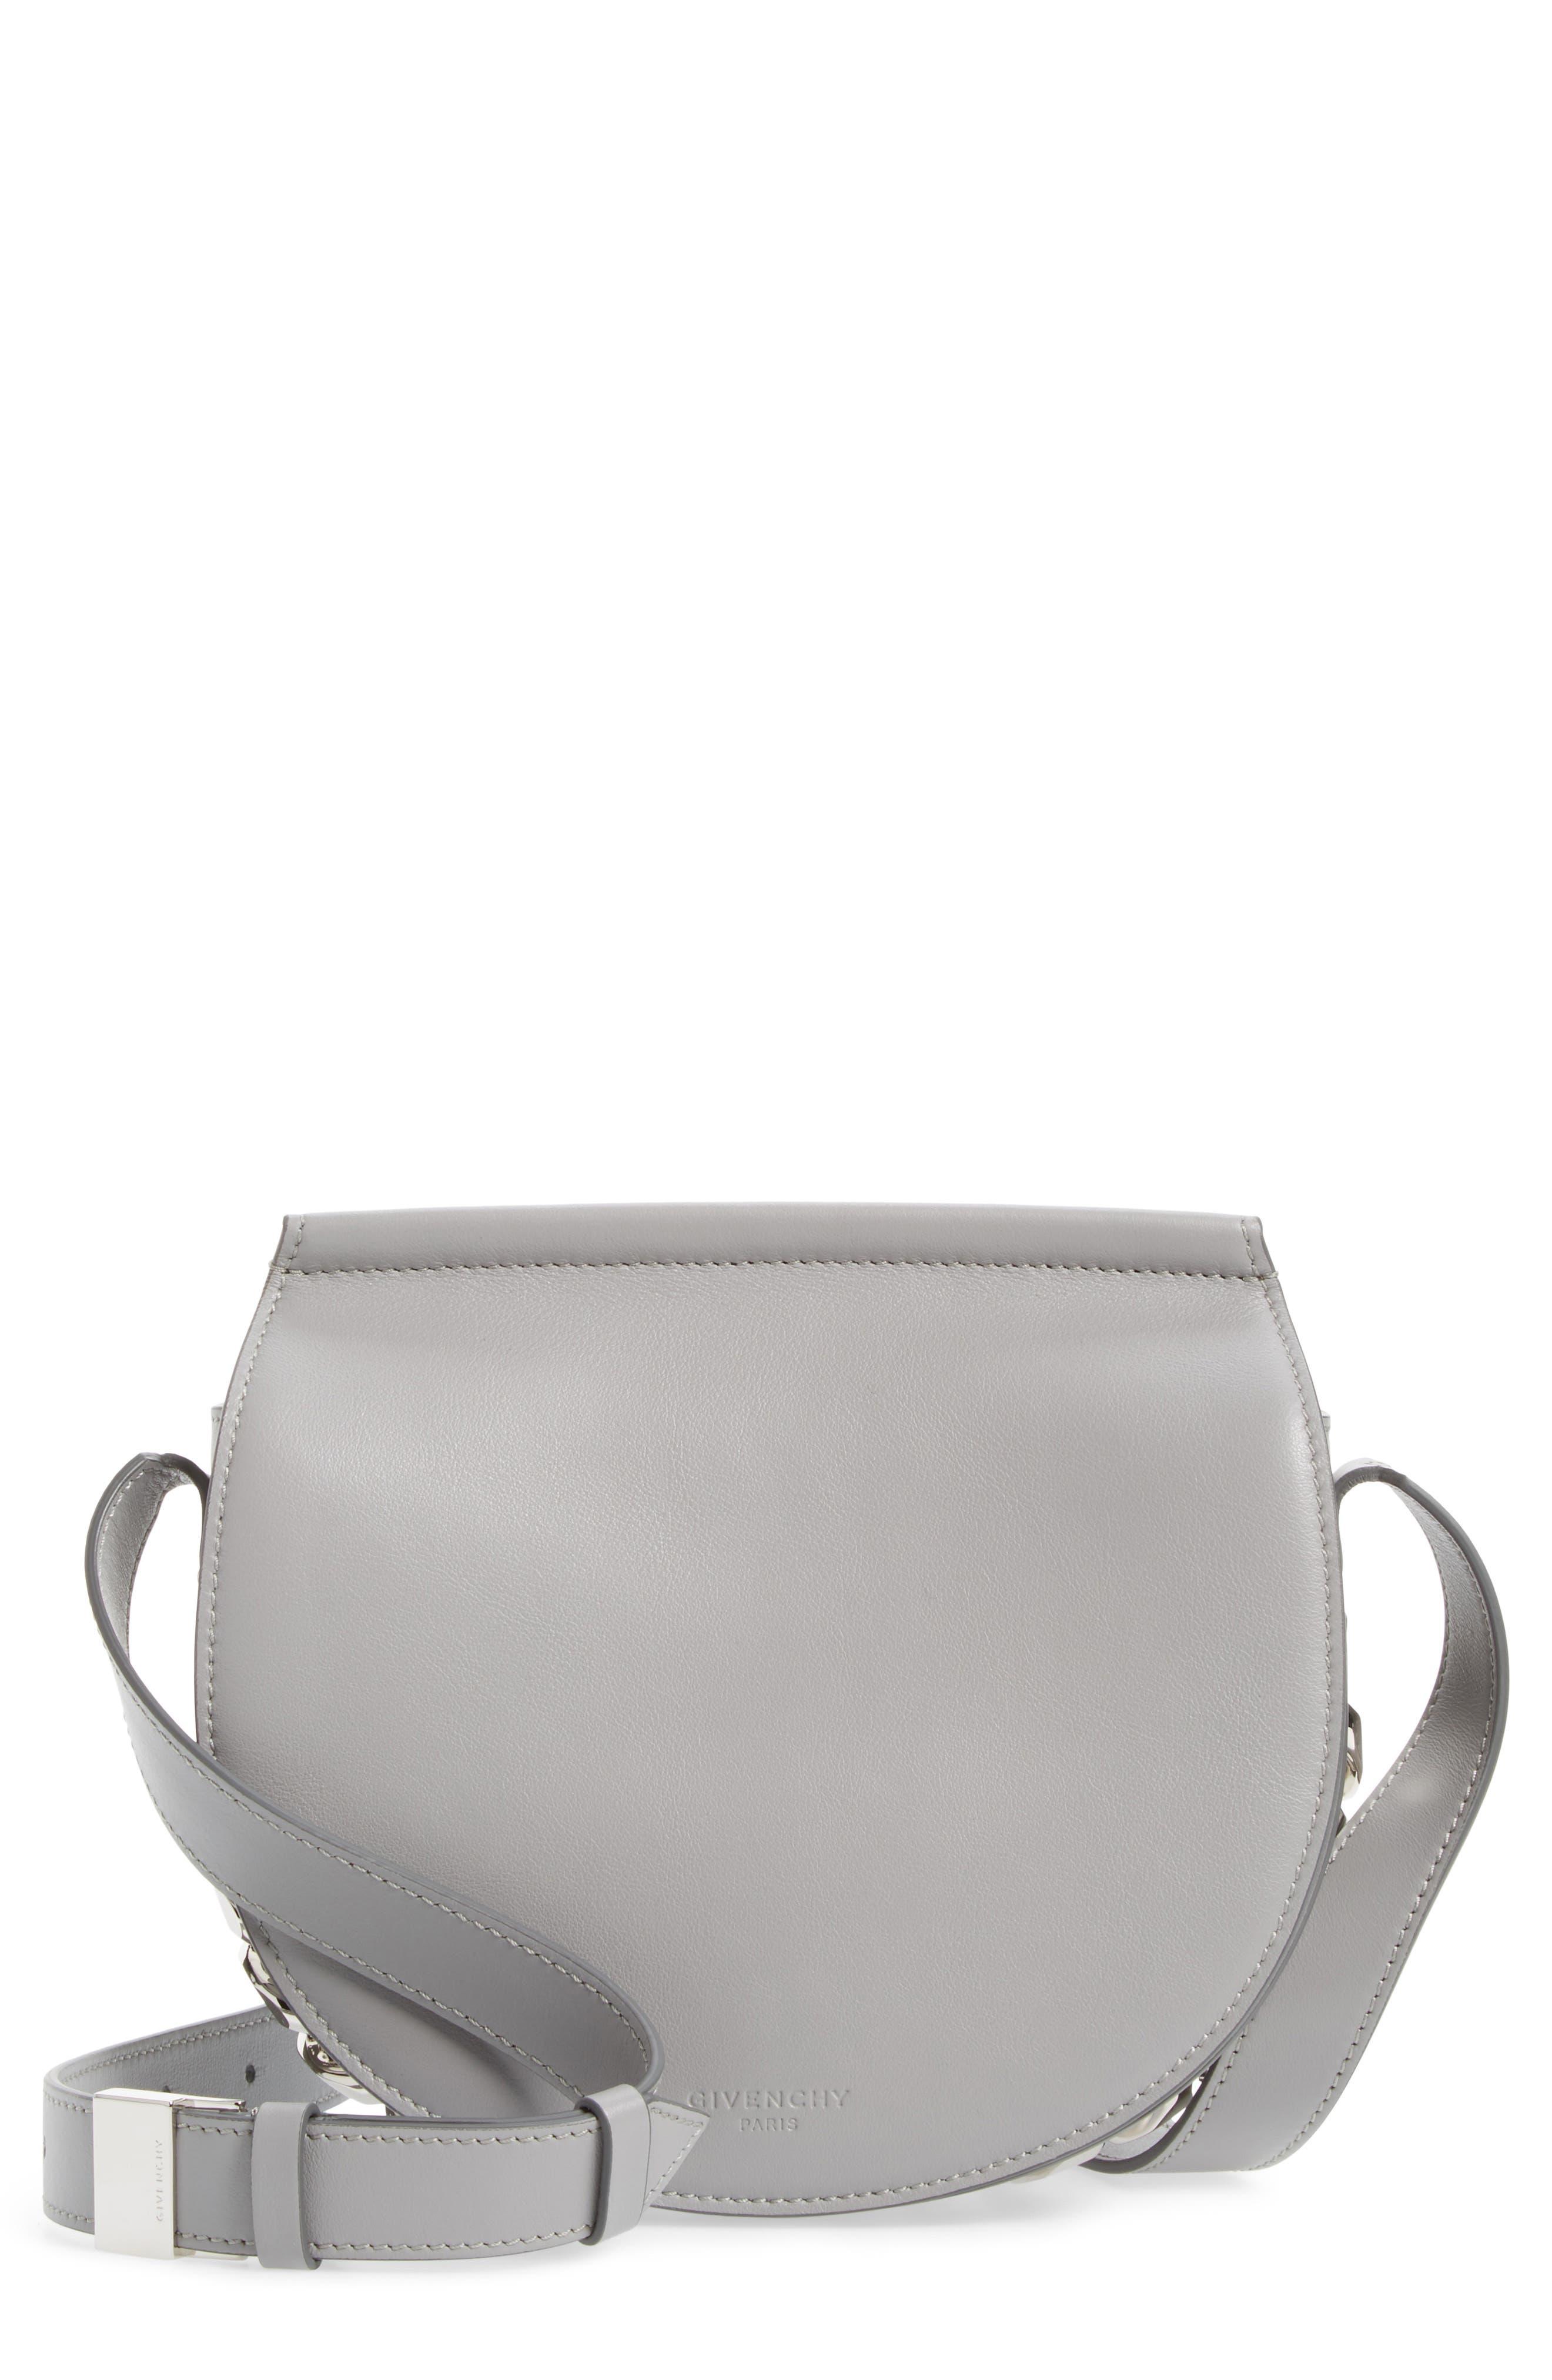 Main Image - Givenchy Mini Infinity Calfskin Leather Saddle Bag